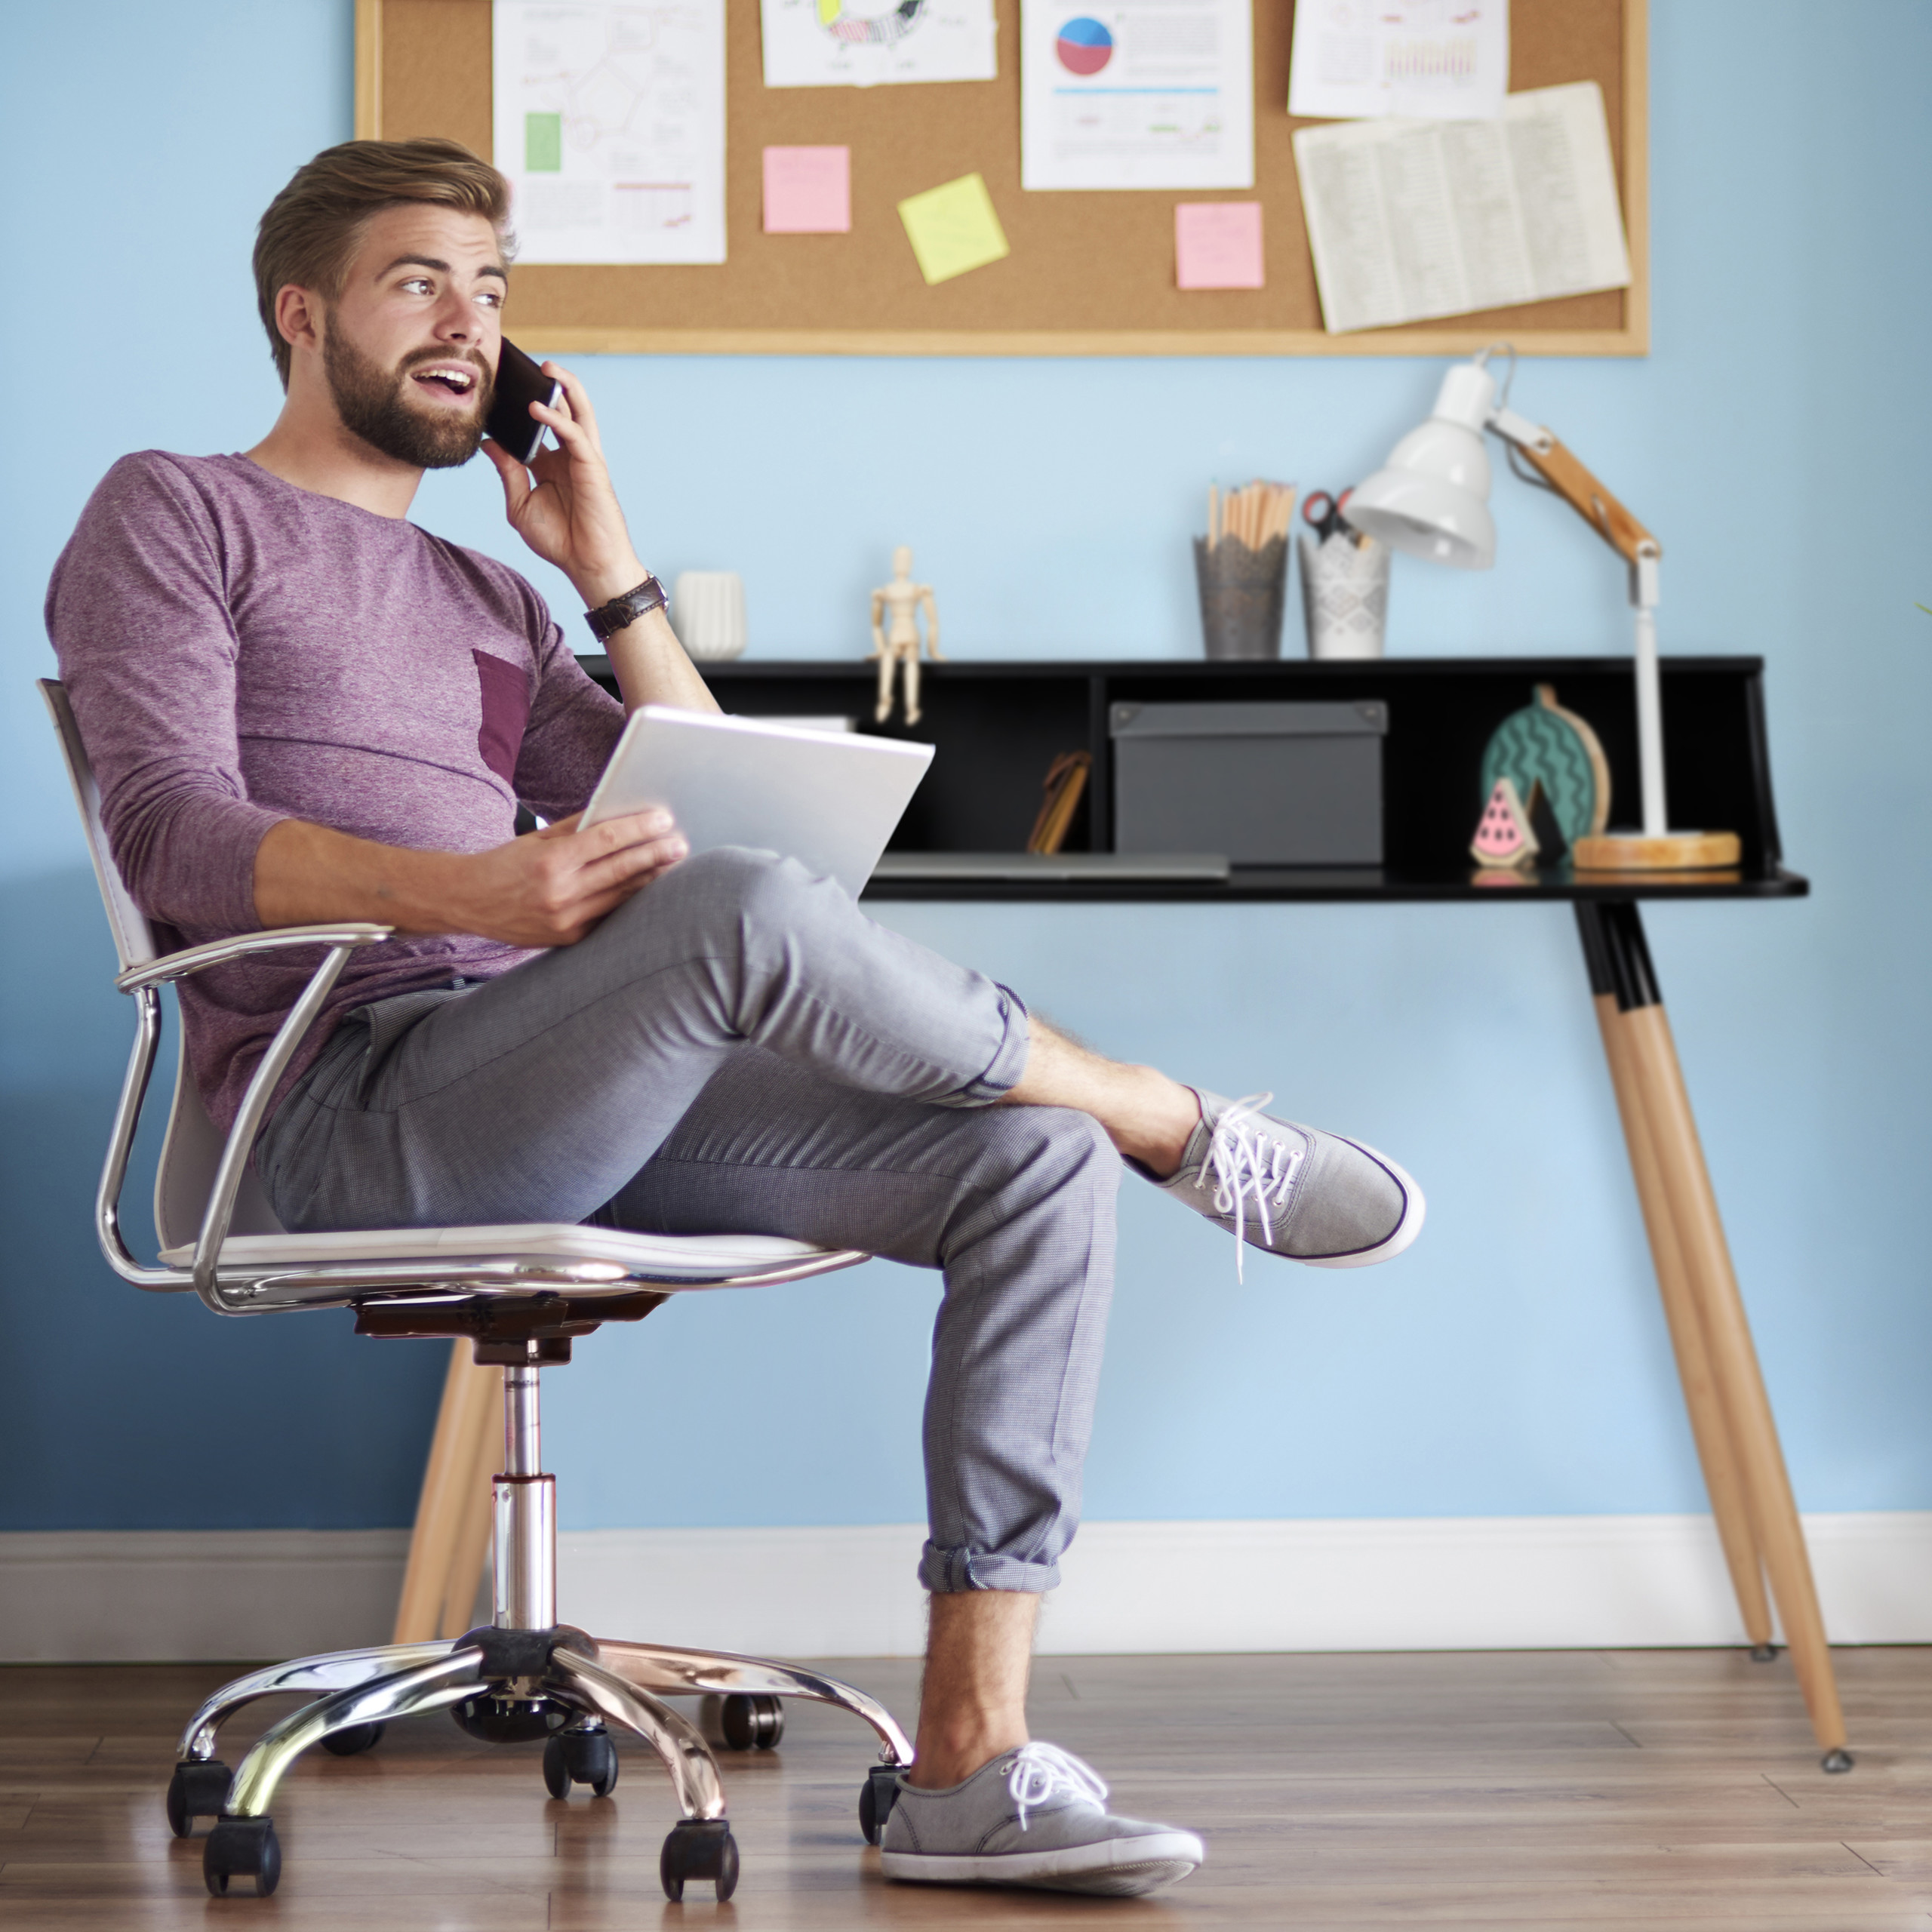 bureau-kinderbureau-ruimtebesparend-75-cm-hoog-laptoptafel-120-breed miniatuur 14